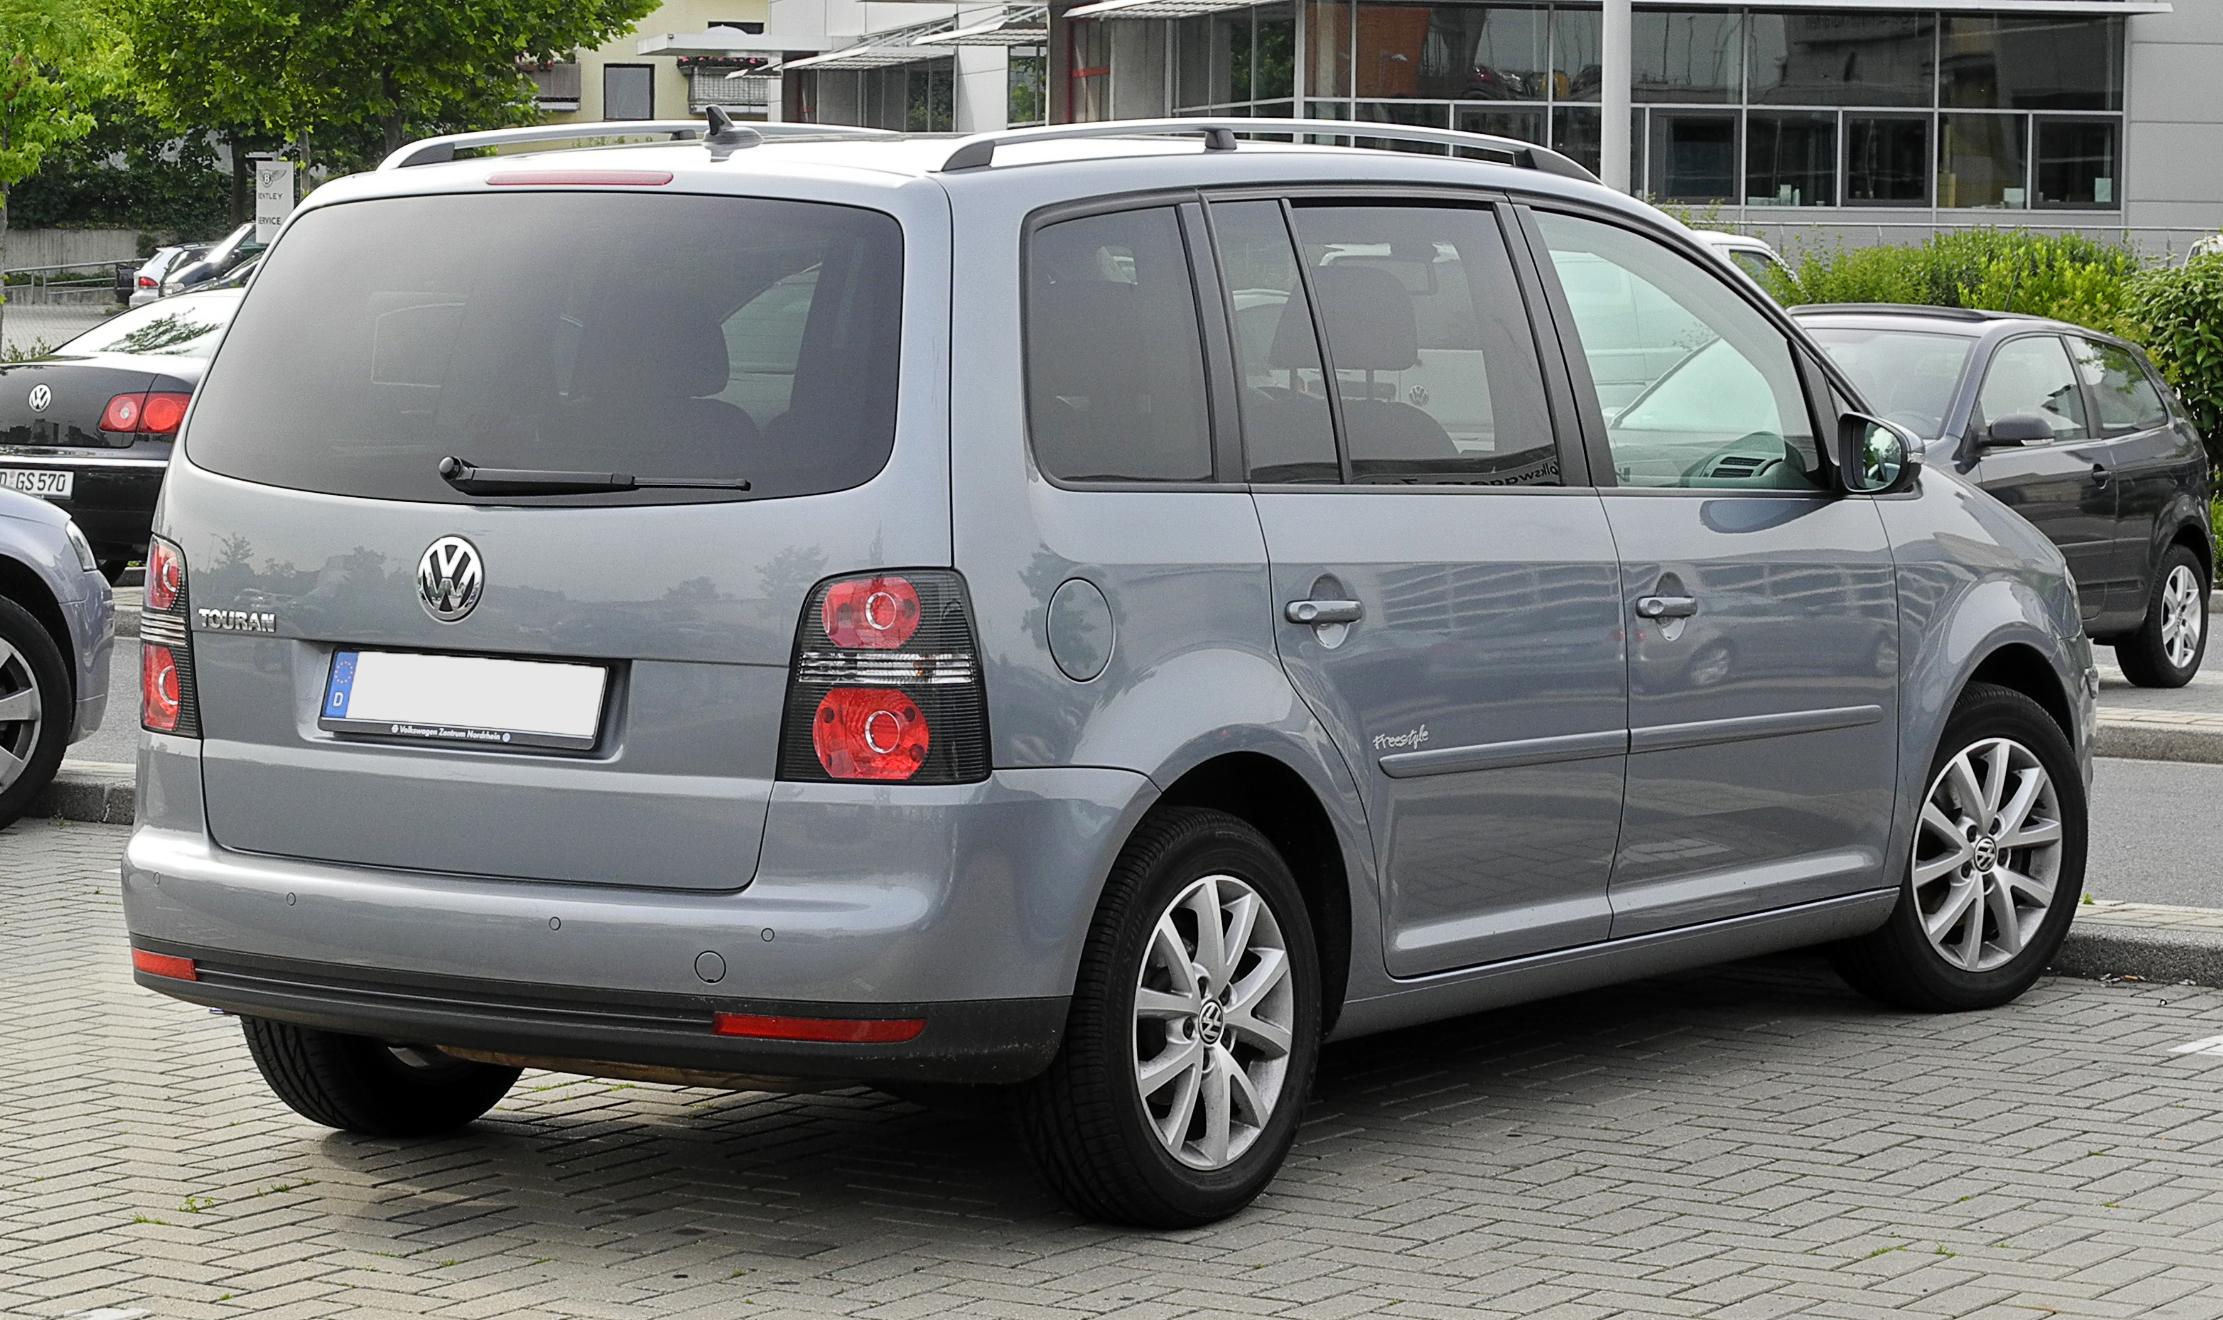 File:VW Touran Freestyle (1. Facelift) – Heckansicht, 12. Juni 2011, Düsseldorf.jpg - Wikimedia ...